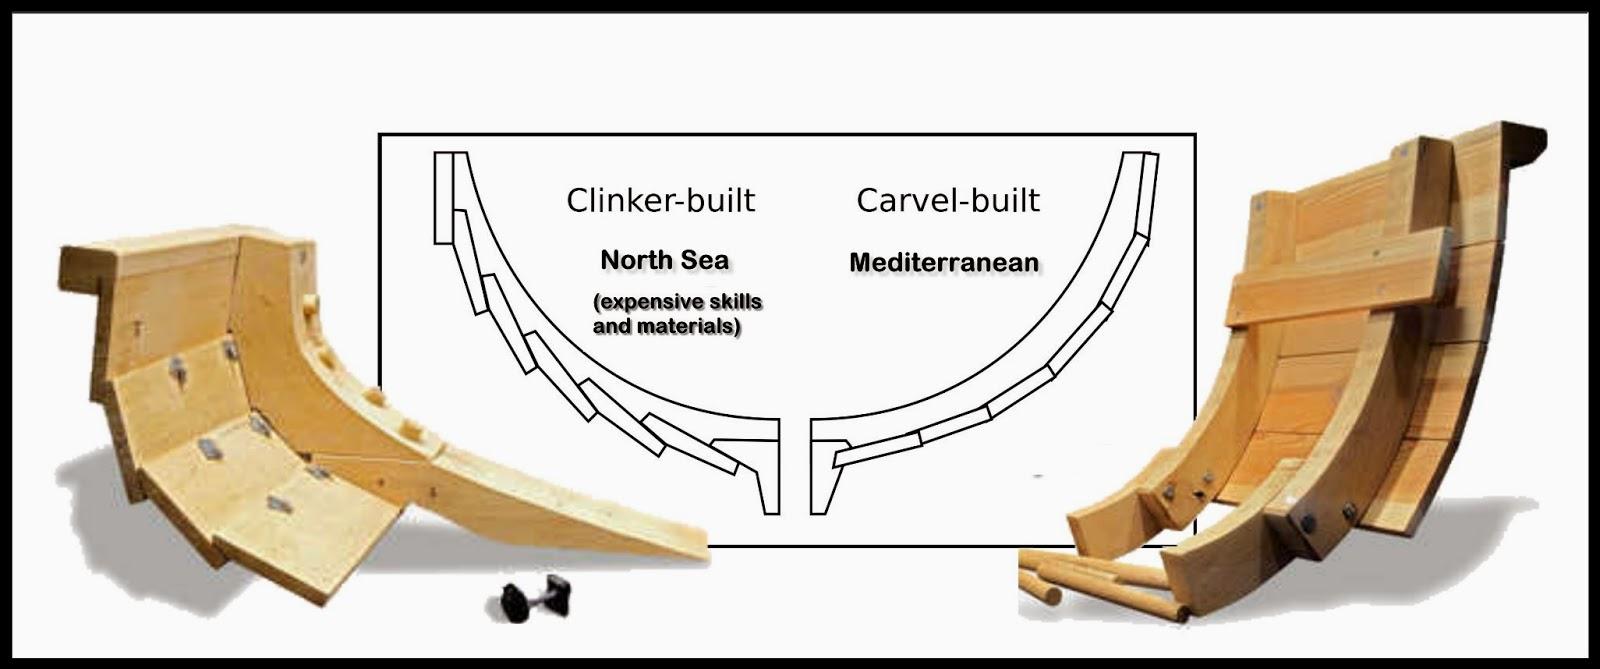 carvel-built